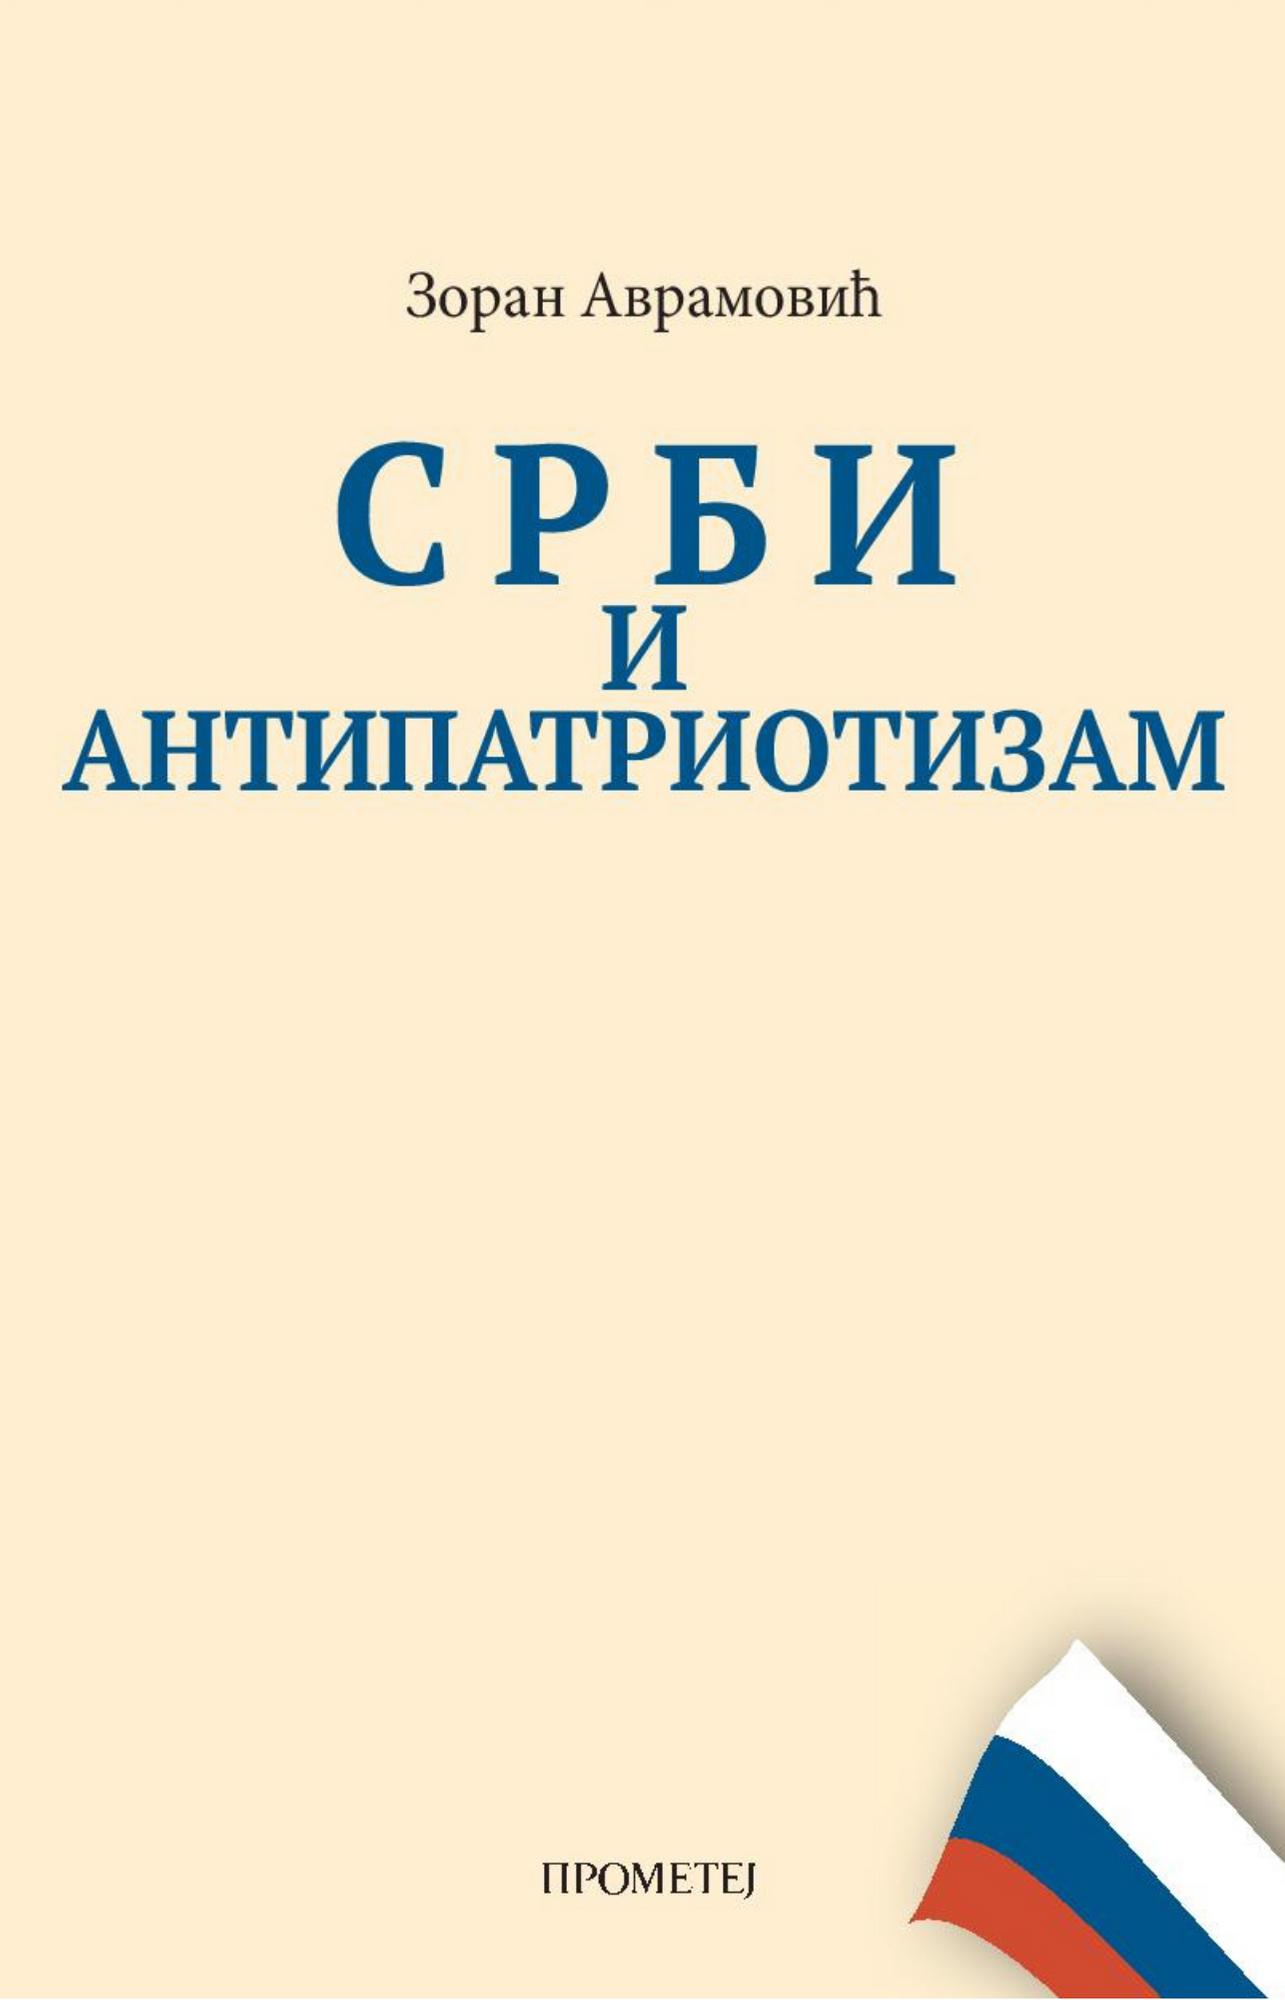 Срби и антипатриотизам